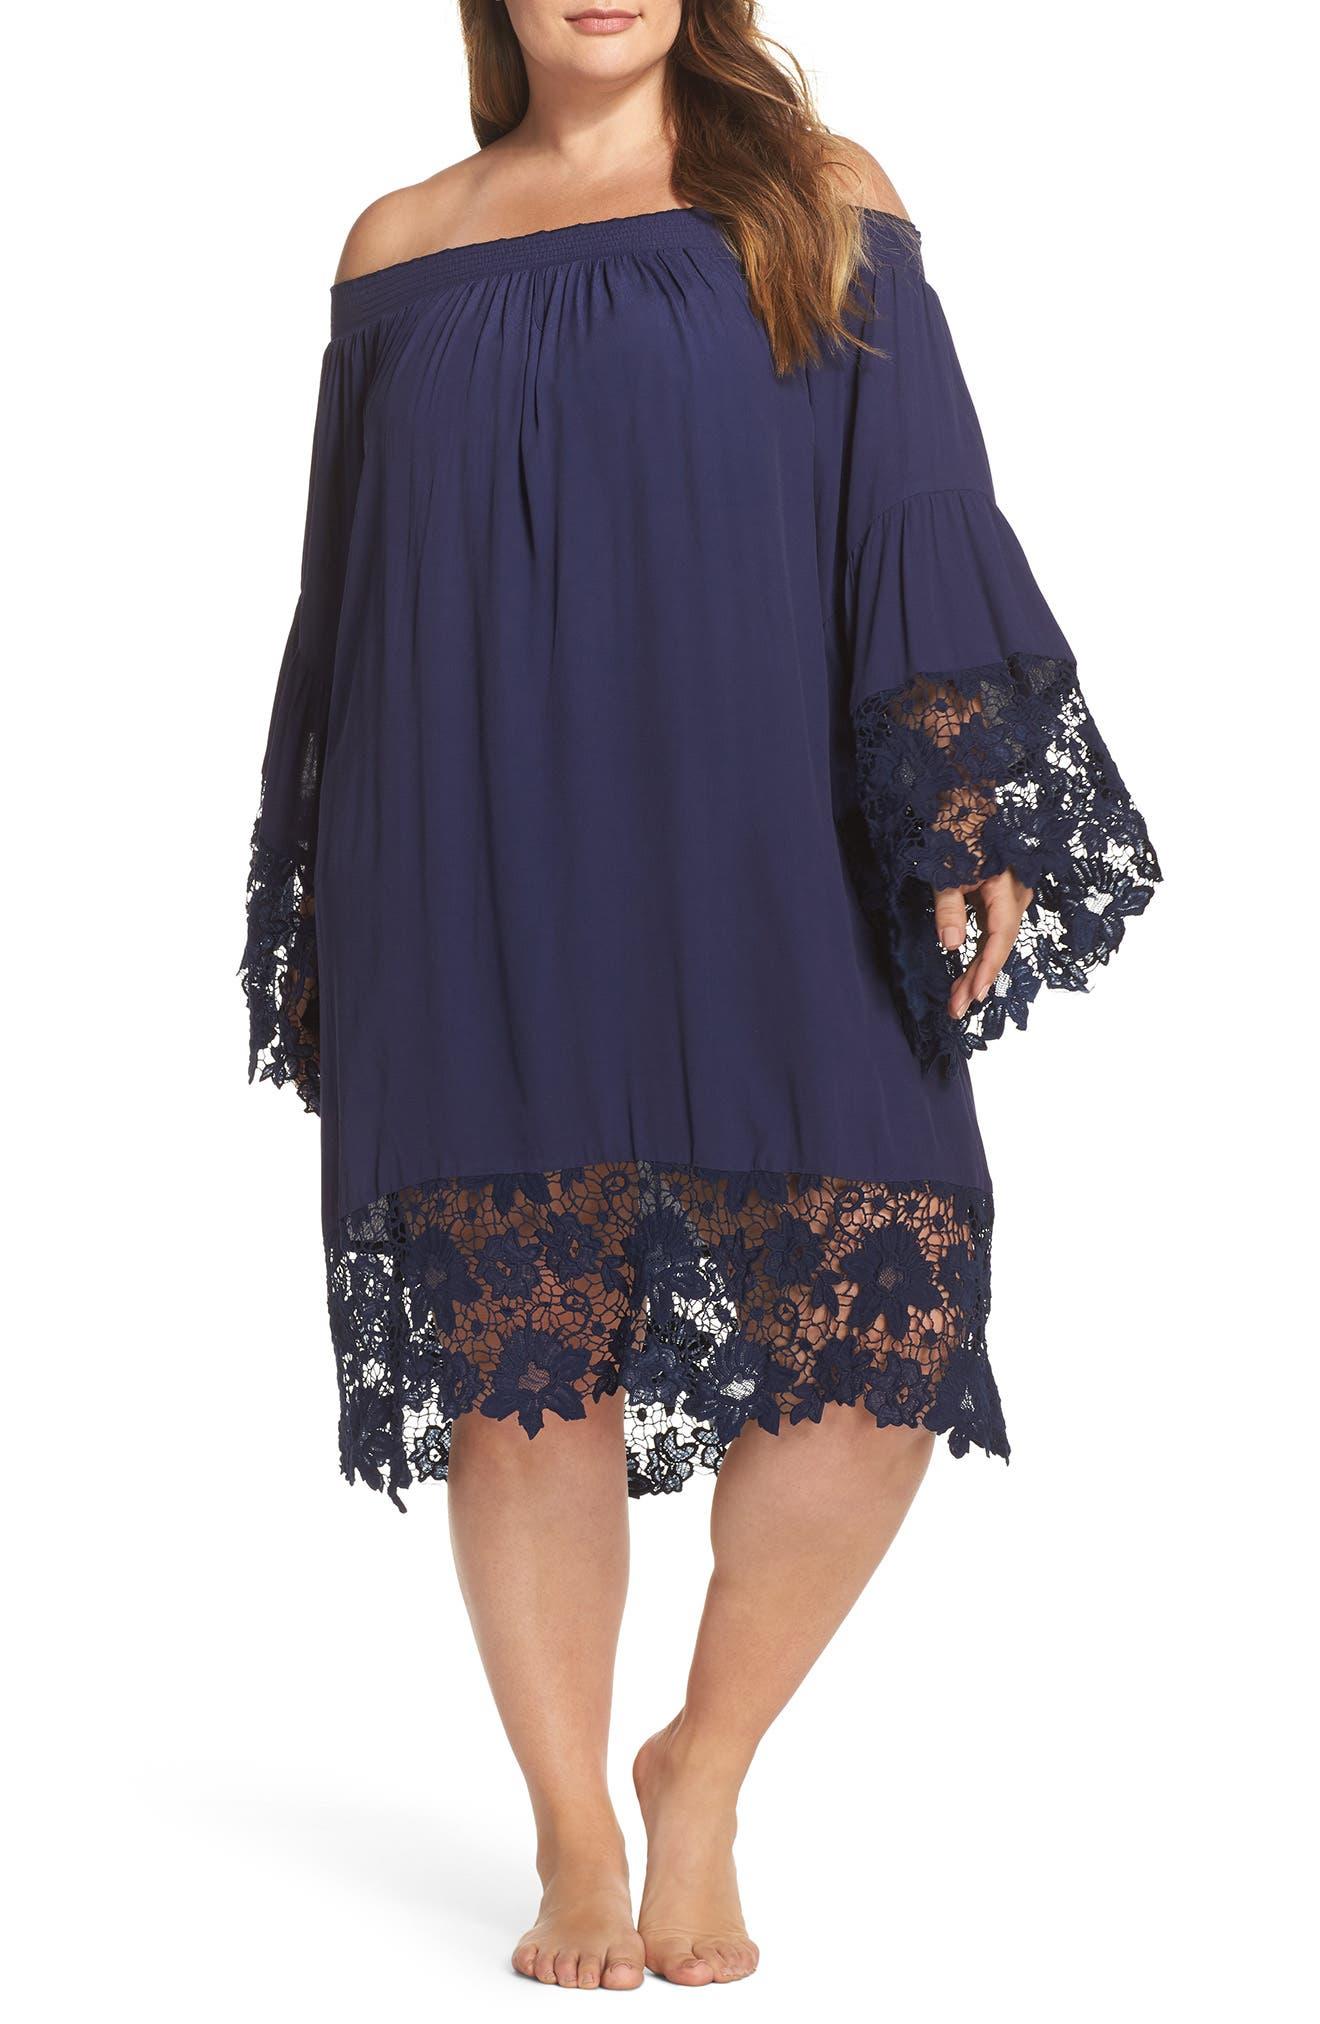 Alternate Image 1 Selected - Muche et Muchette Jolie Lace Accent Cover-Up Dress (Plus-Size)